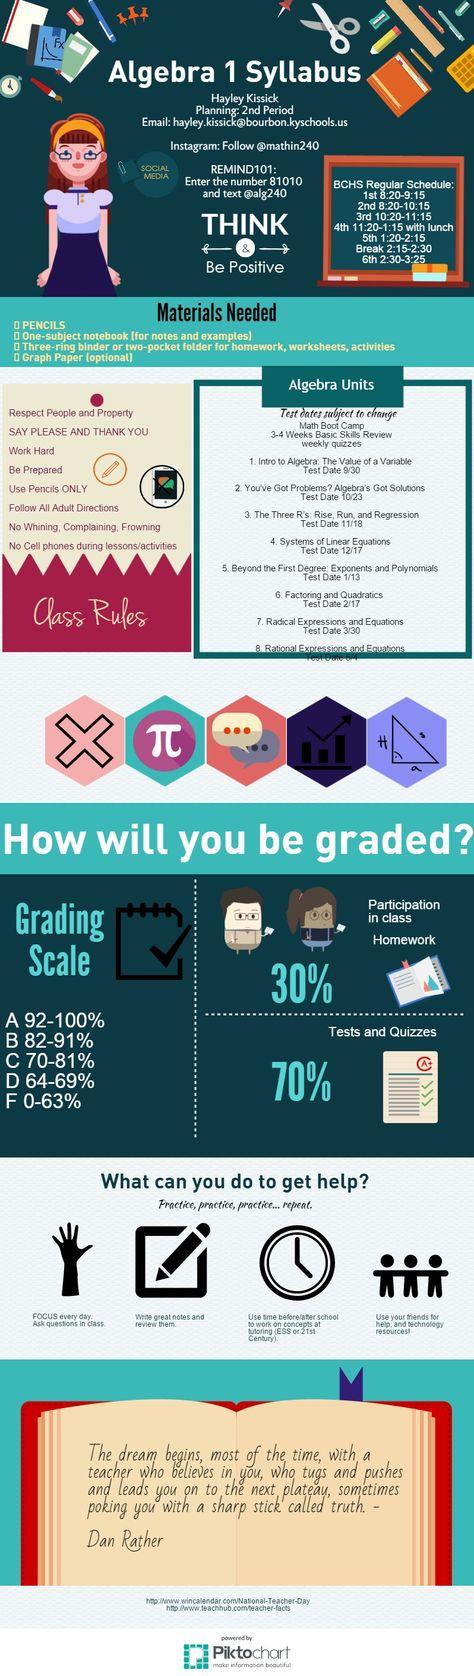 Algebra 1 Syllabus | @Piktochart Infographic | Math | Pinterest ...